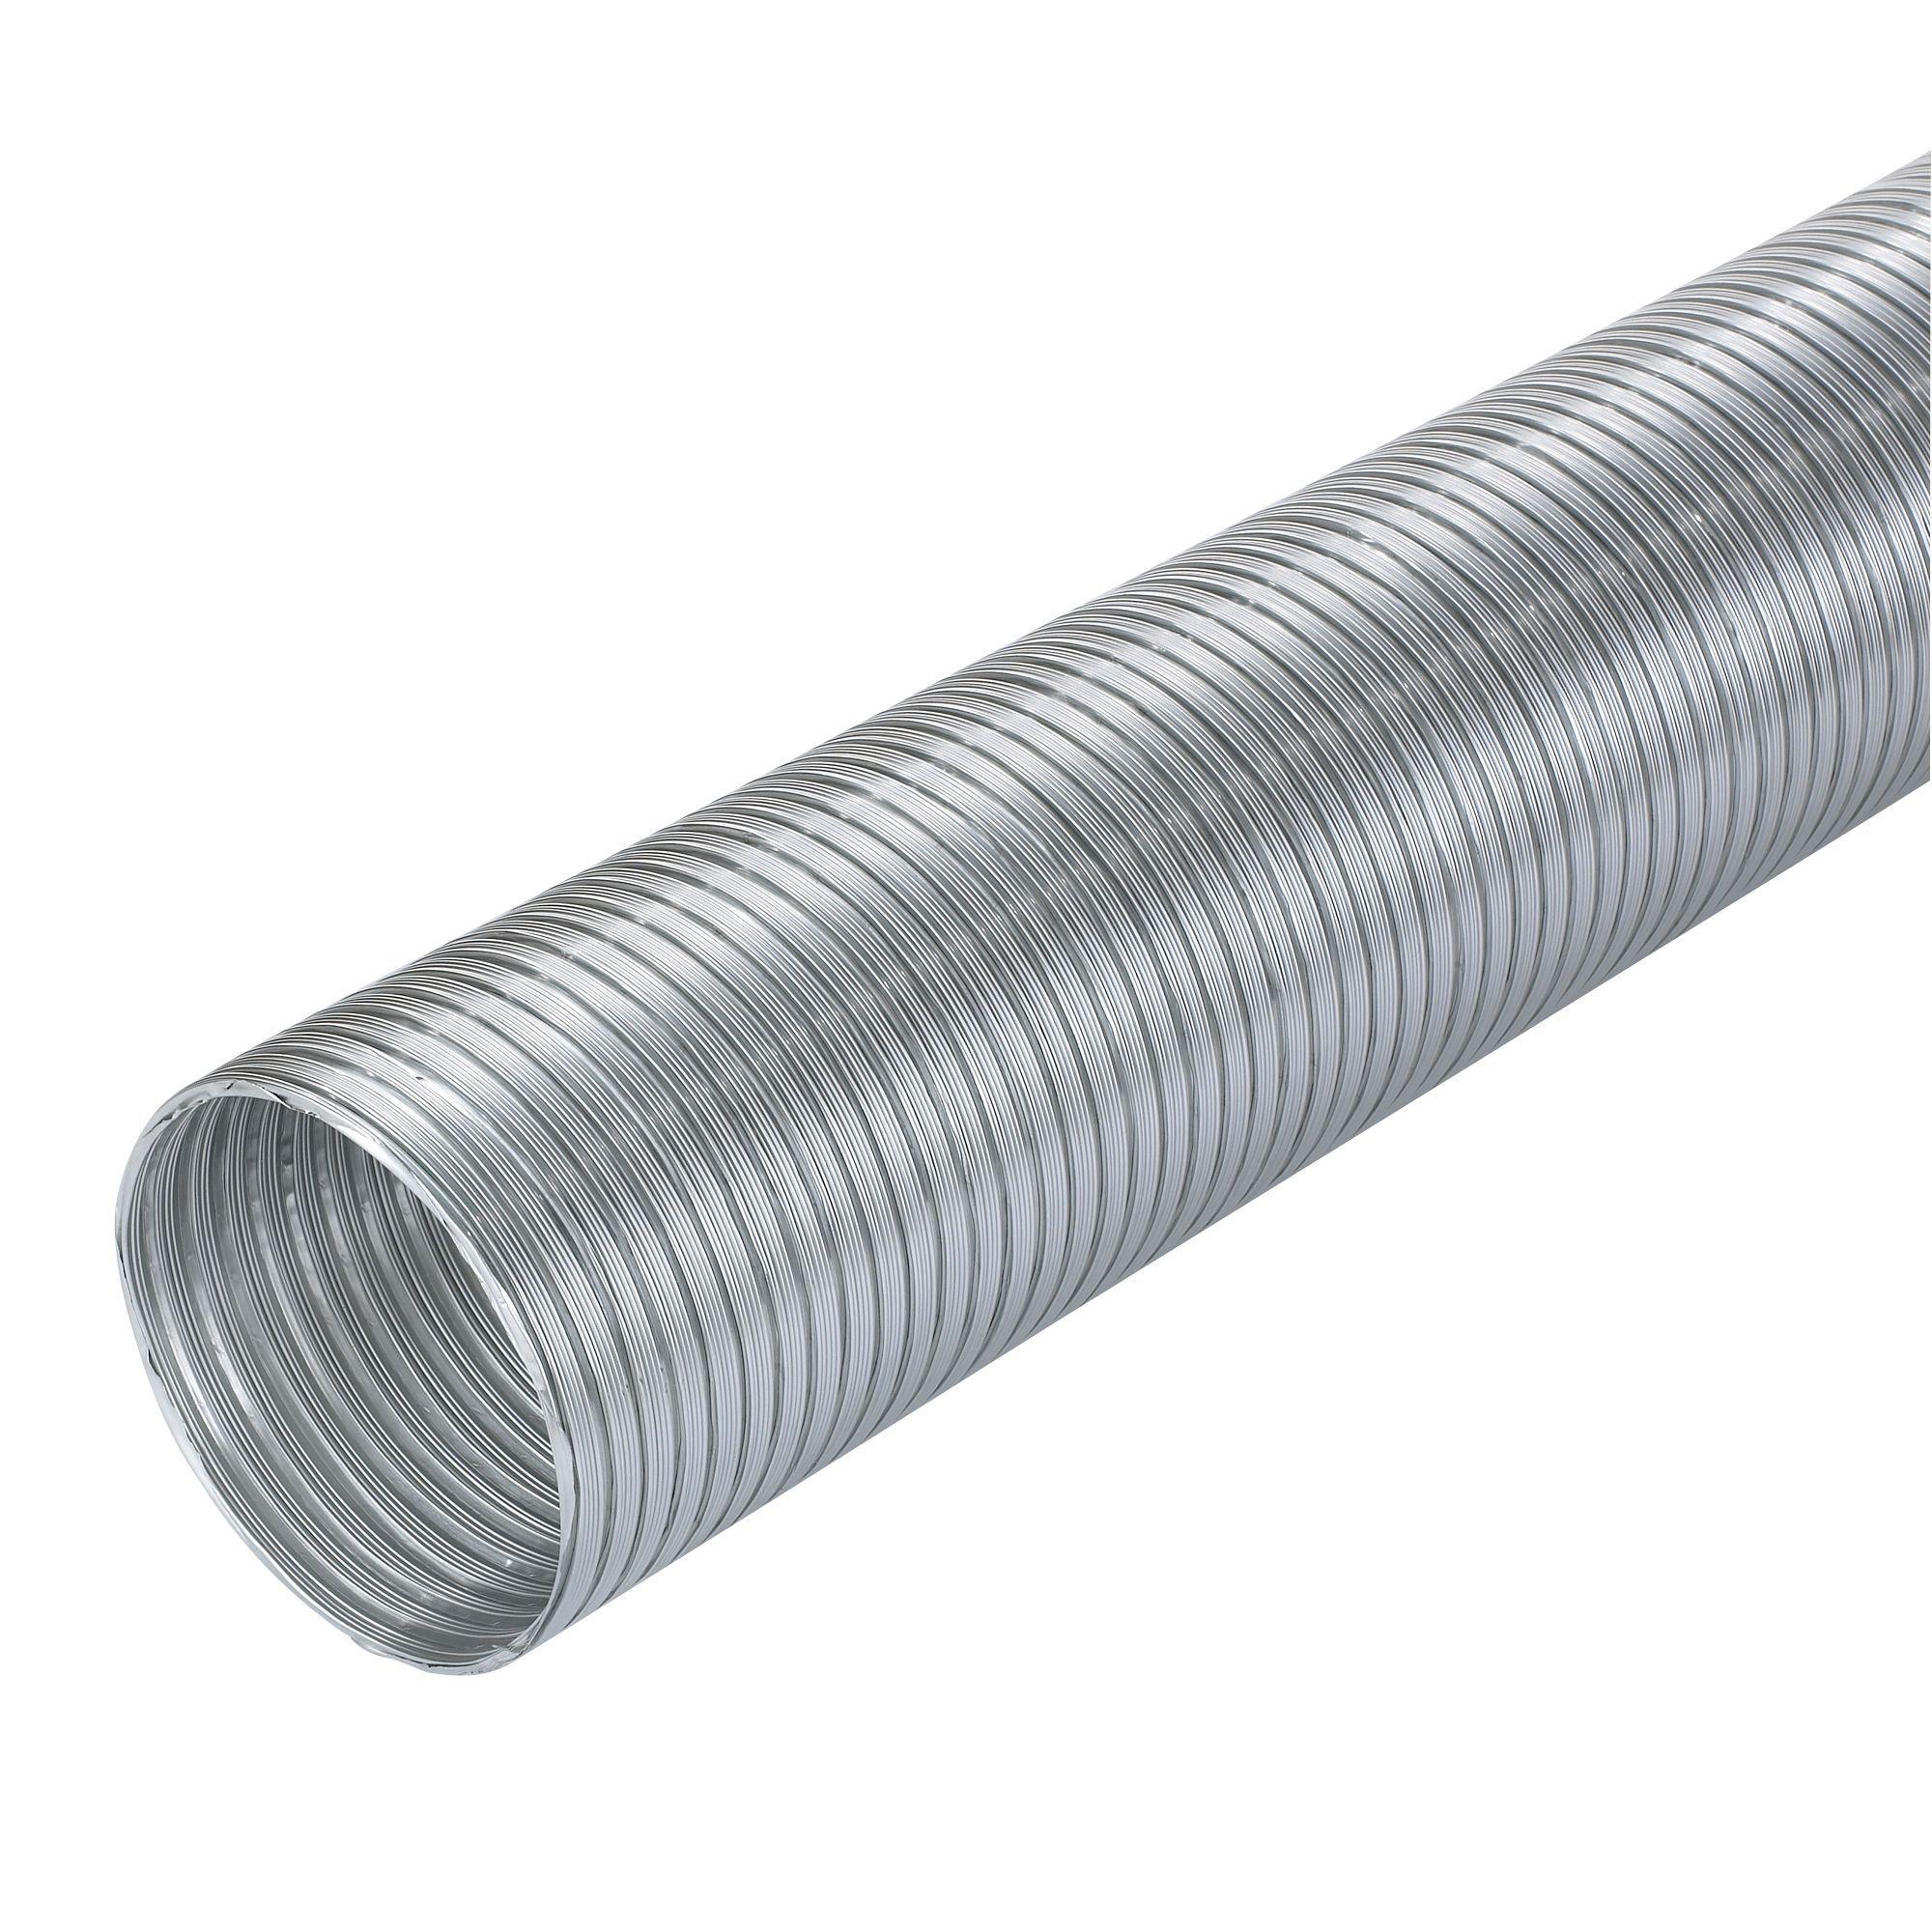 Manrose Silver Semi Rigid Hose (H)140mm, Pack of 1 ...